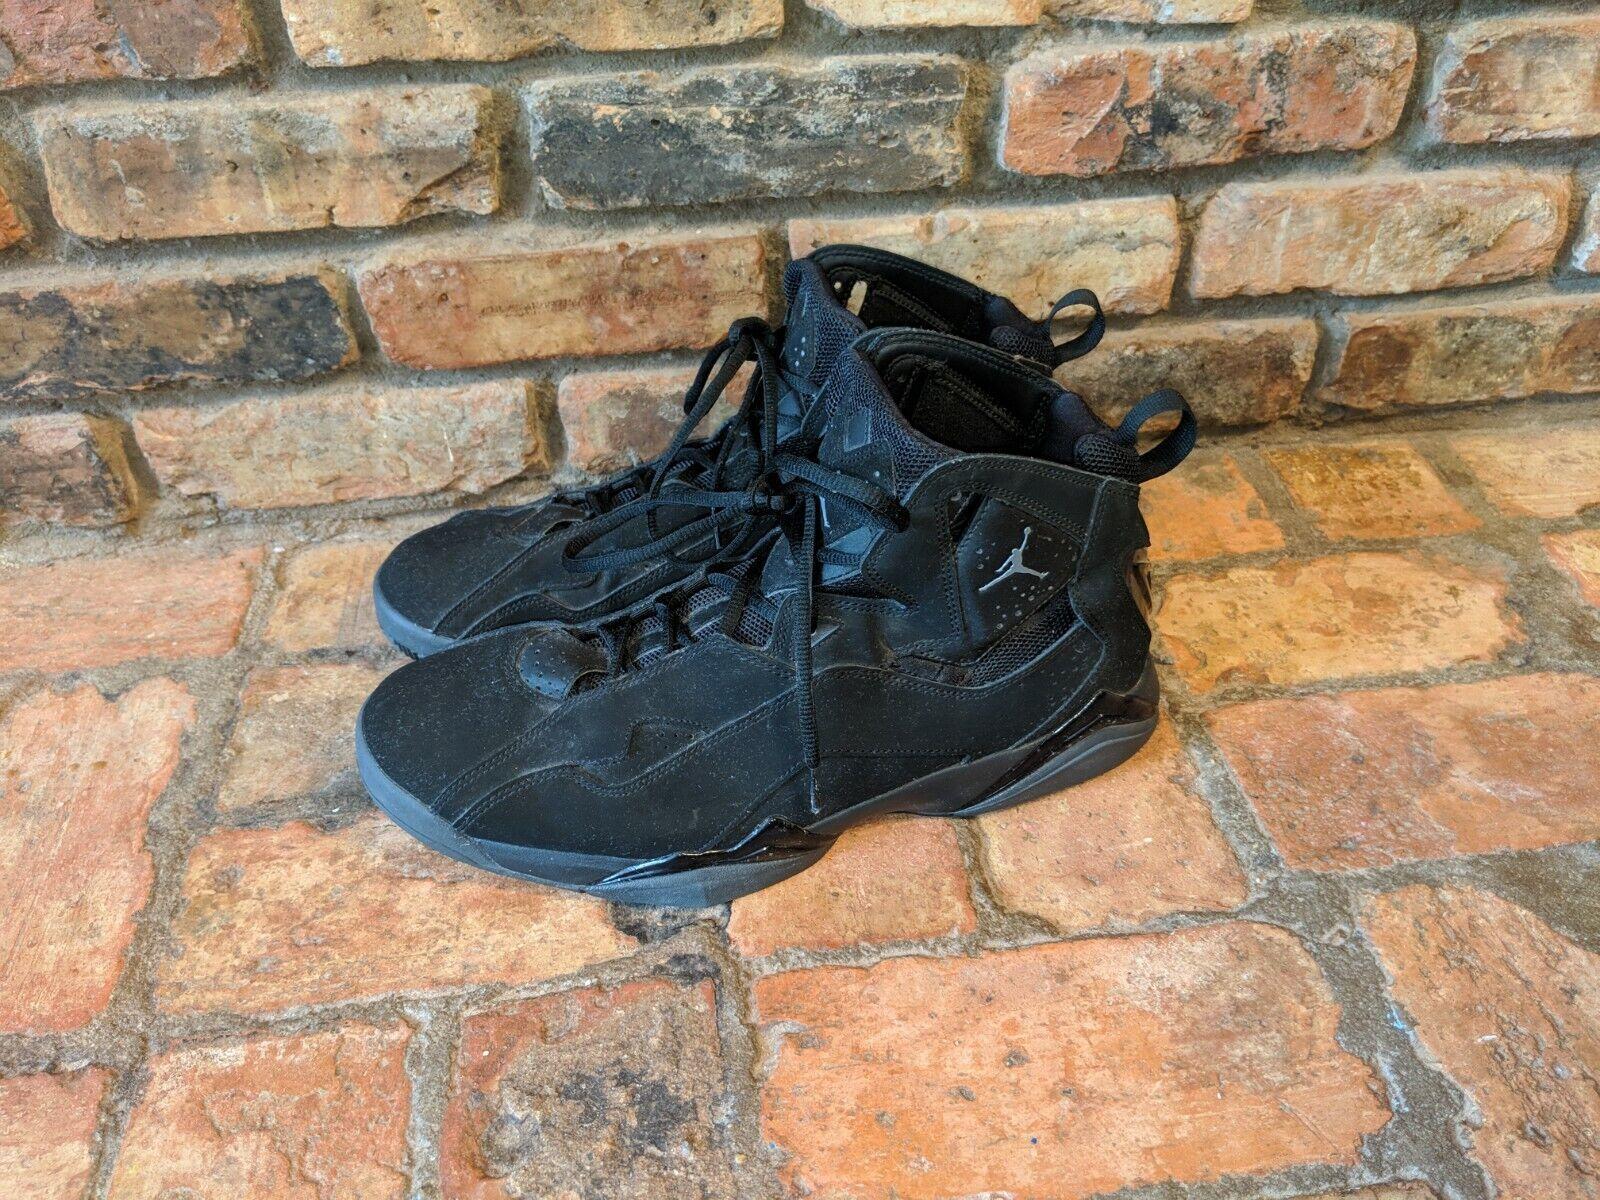 Nike Air Jordan 1 Basketball shoes. Size 14. Black. Worn once